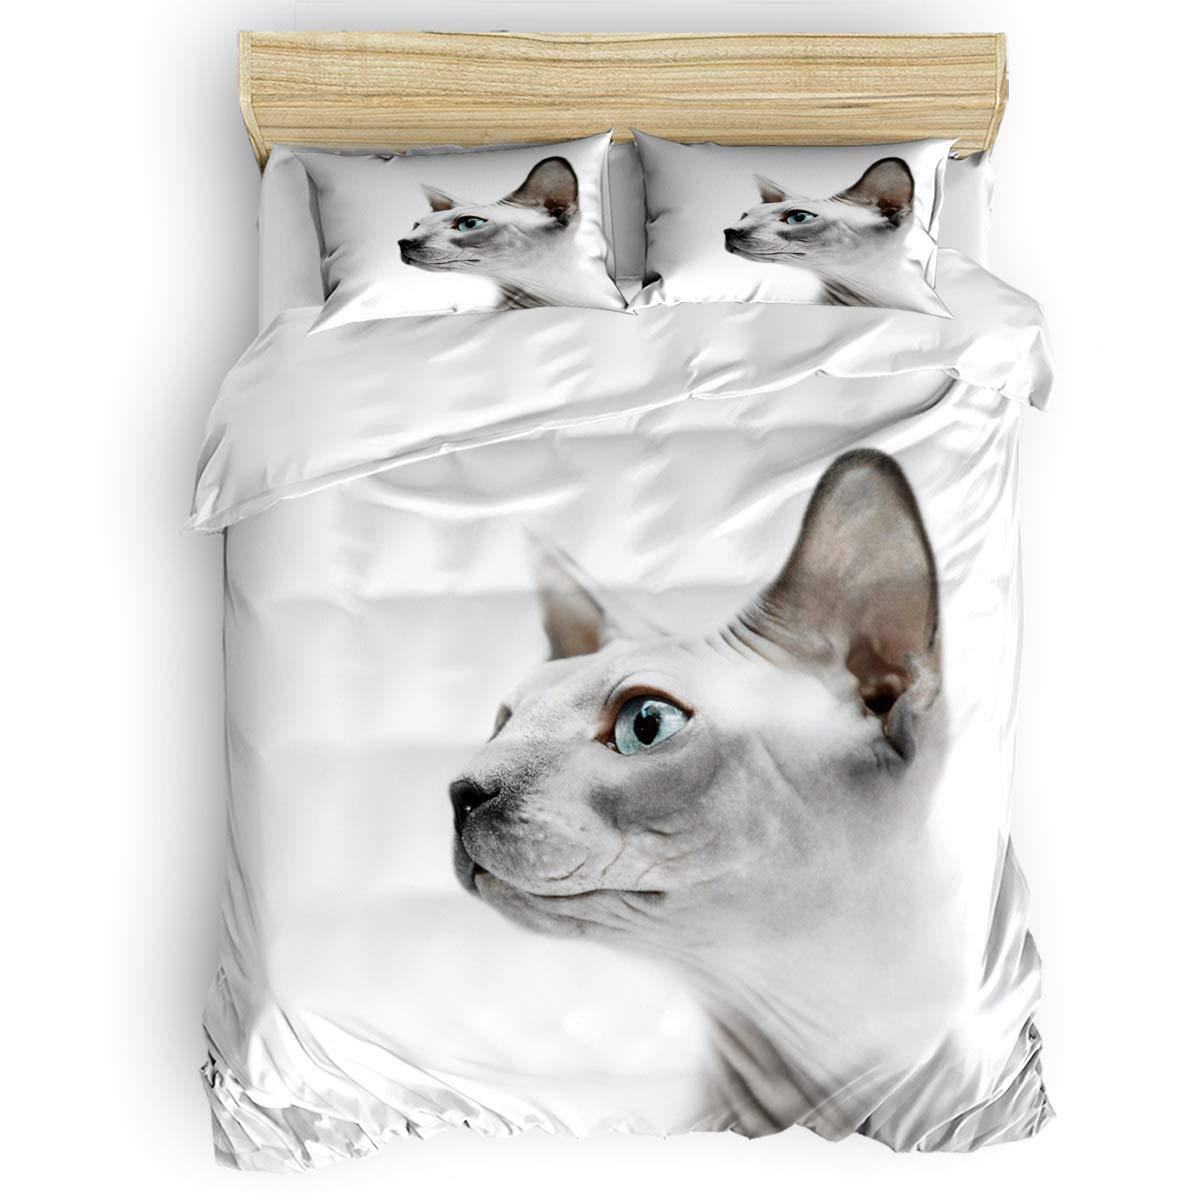 SODIKA 掛け布団カバーセット ウェルカムソフトコットン寝具セット ファスナー開閉 大人/子供用 掛け布団キルトカバー (4点、掛け布団カバー1枚、フラットシーツ1枚、枕カバー2枚) Twin Size B07PBWDNK5 Cat4soa2555 Twin Size